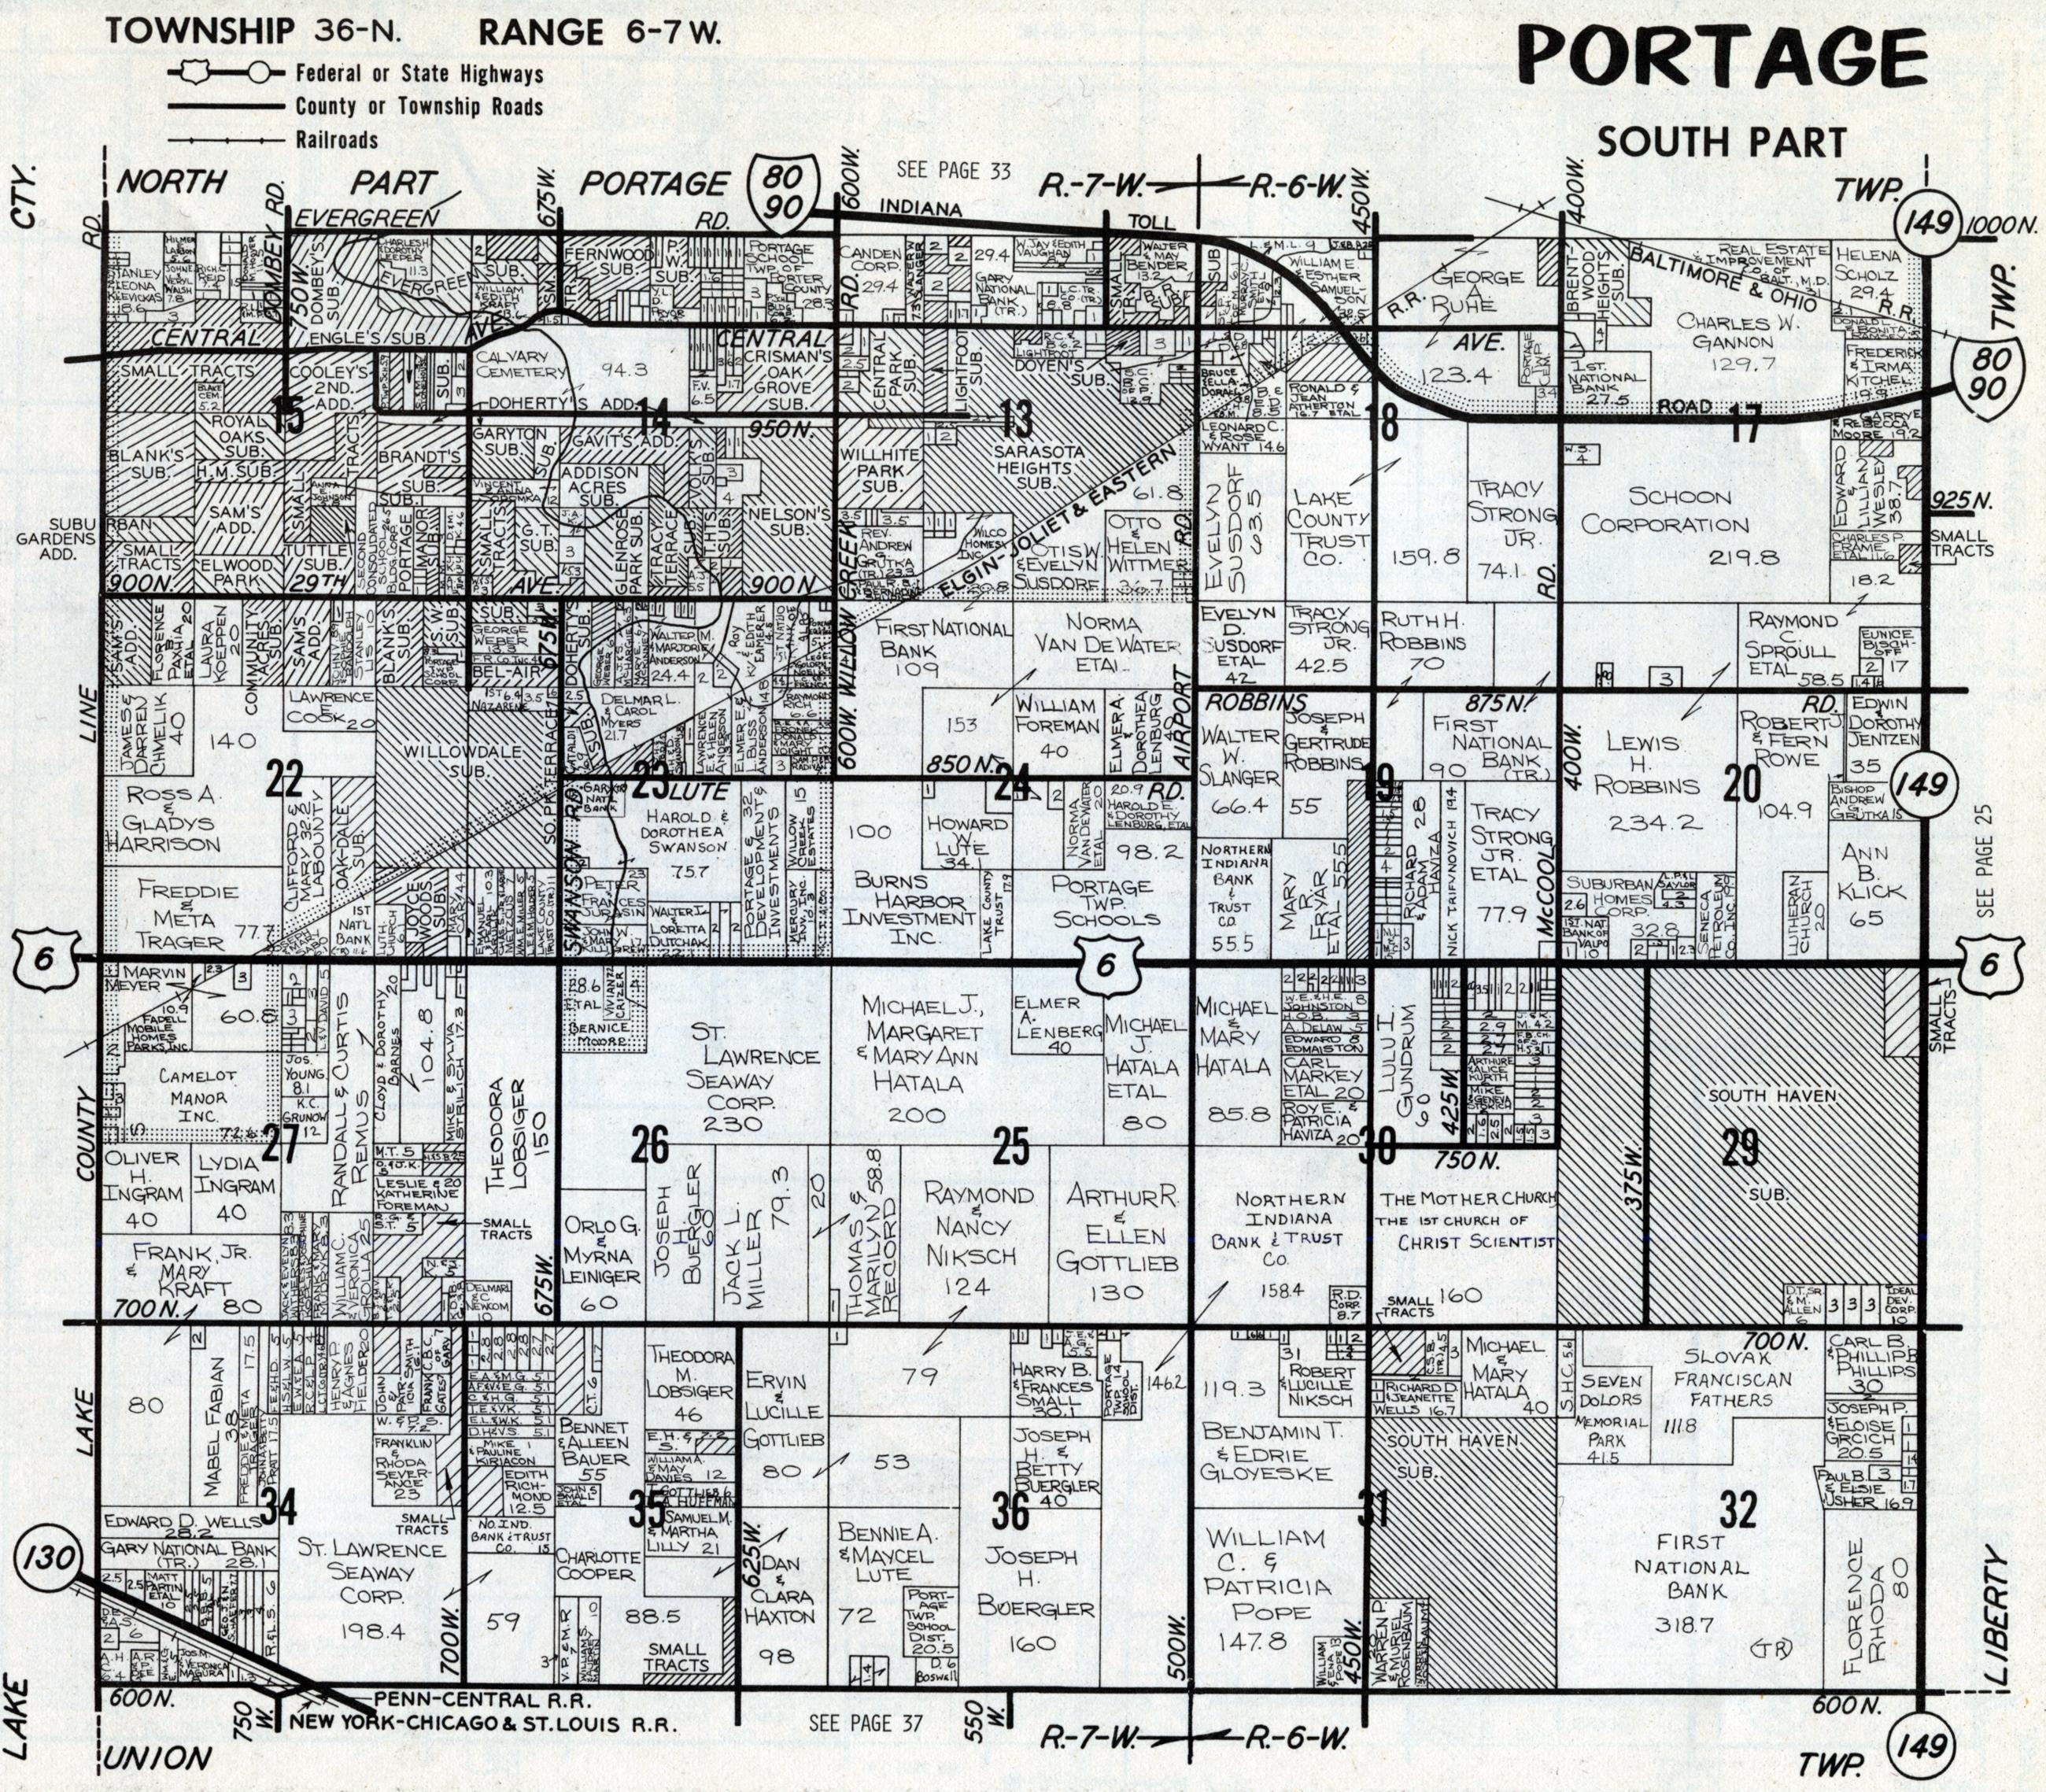 Porter County Indiana Genweb Portage Township Maps